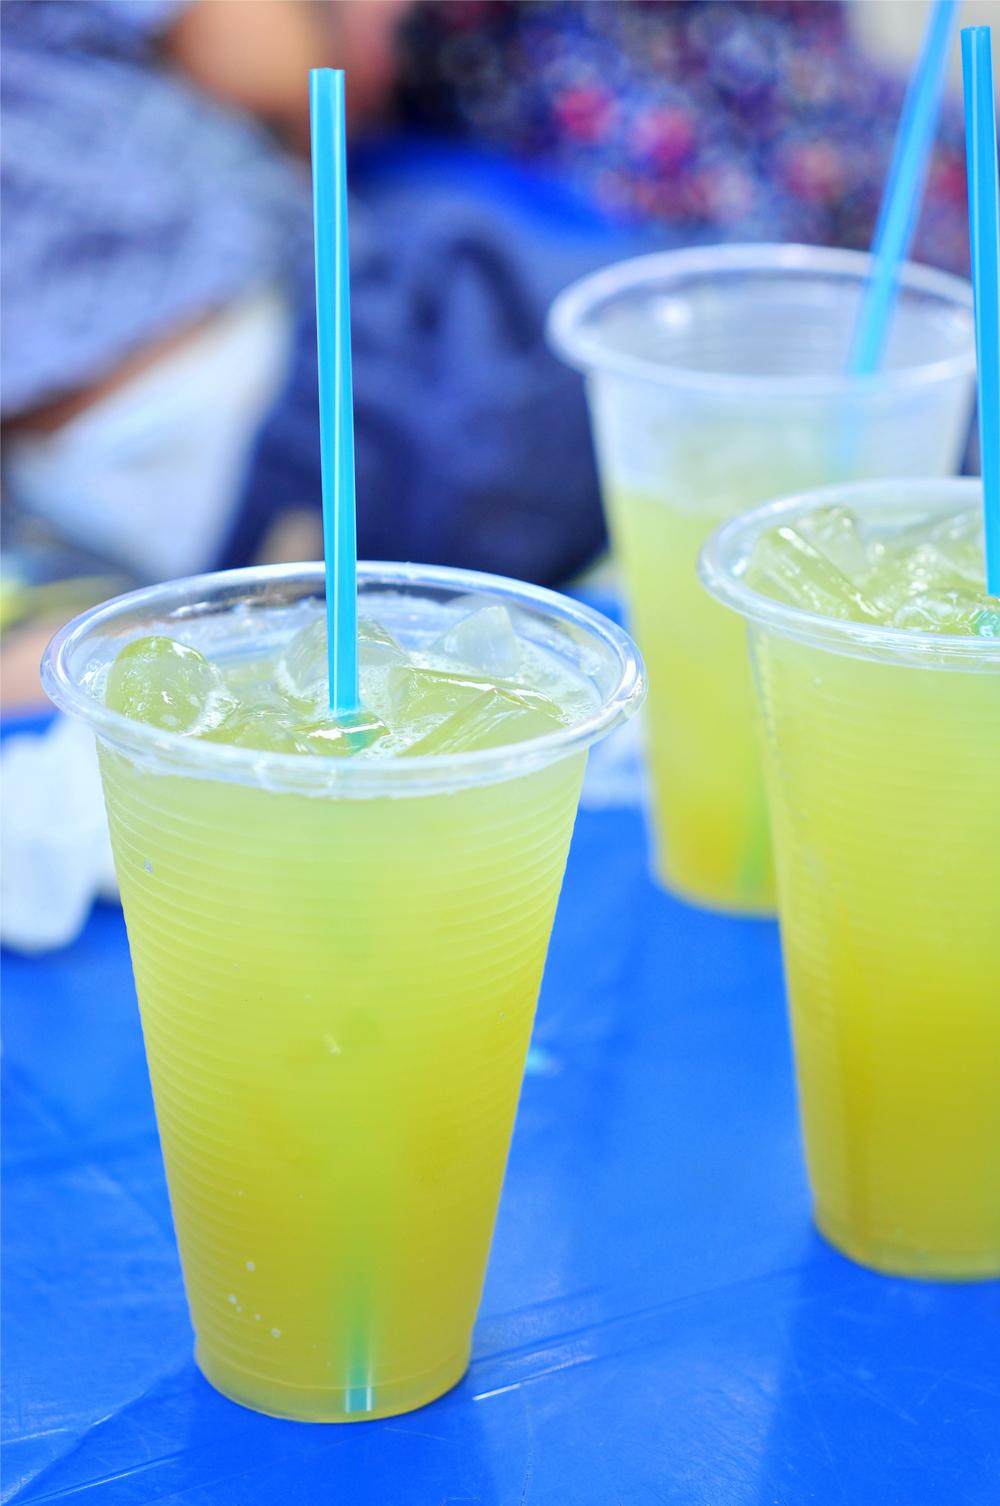 Sugar cane juice...